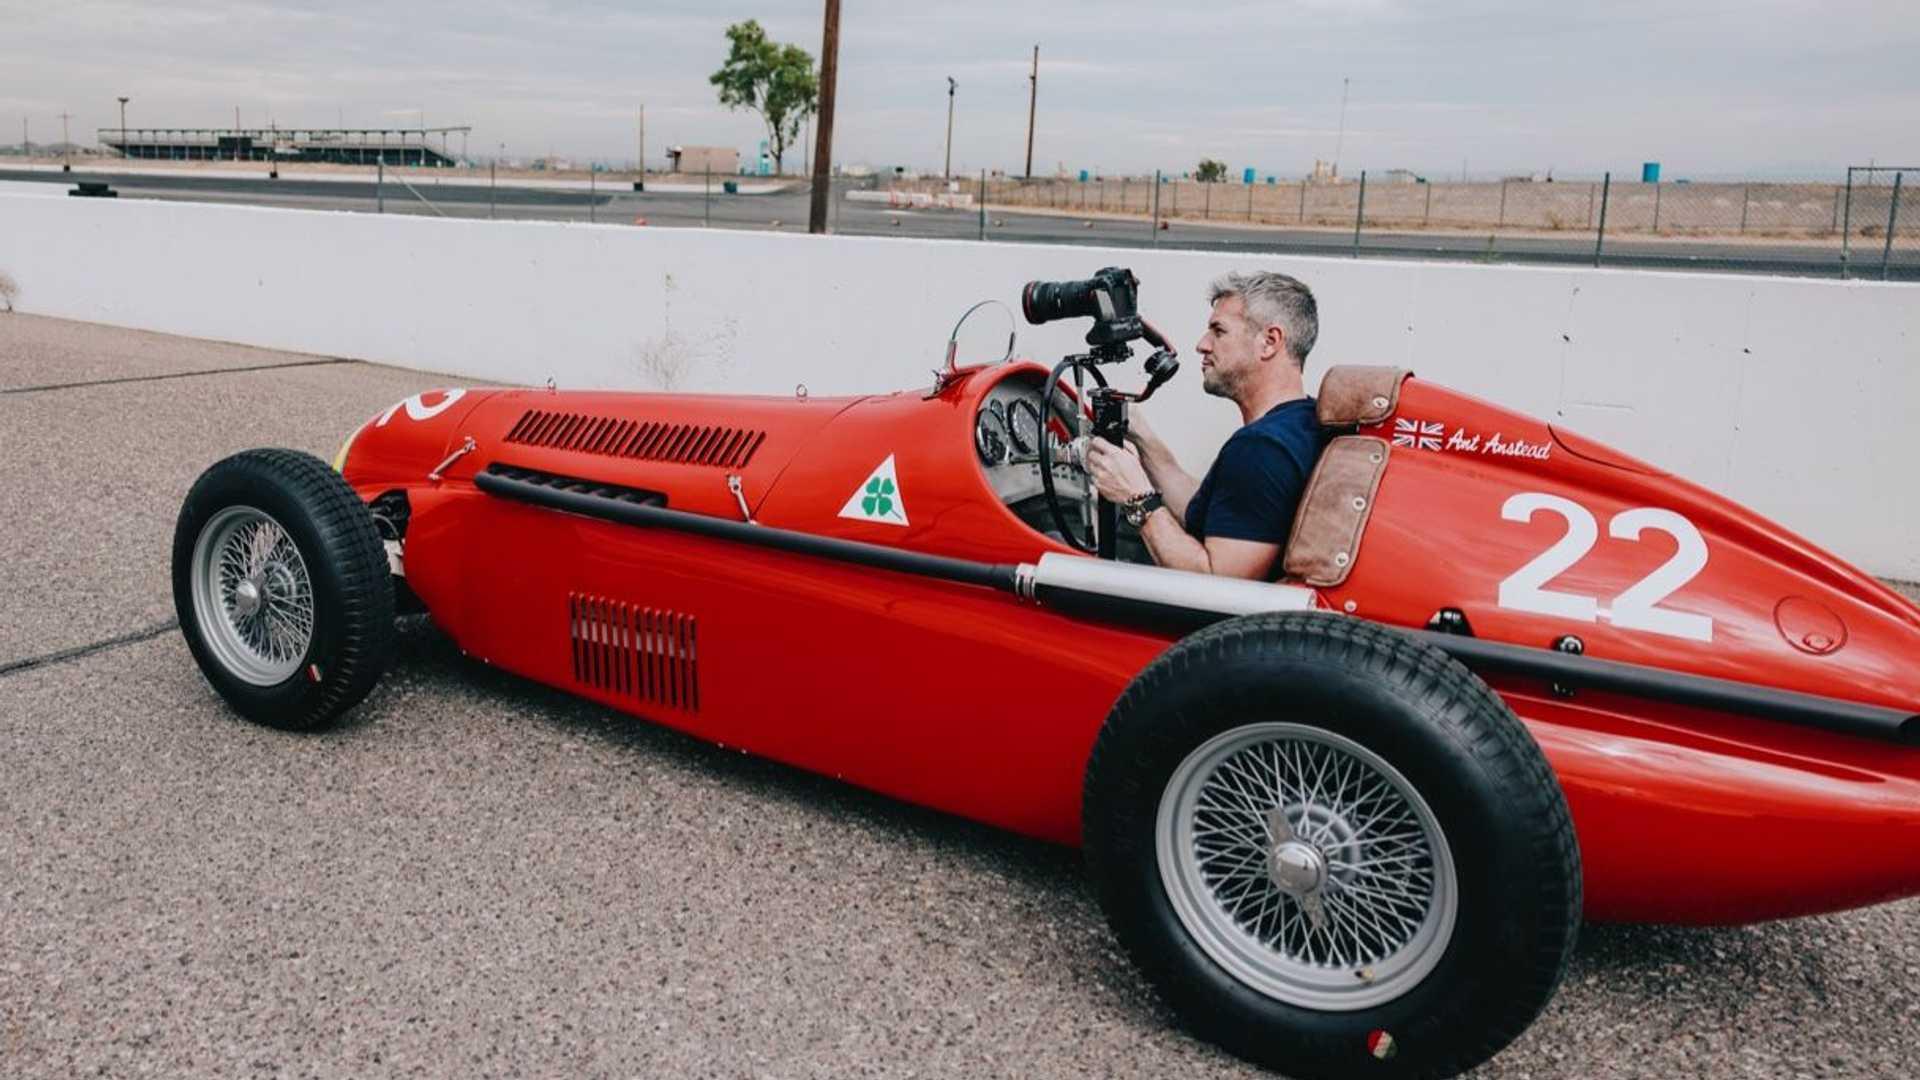 Turn Your Mazda Miata Into A 1930s Alfa Romeo Race Car With This Kit